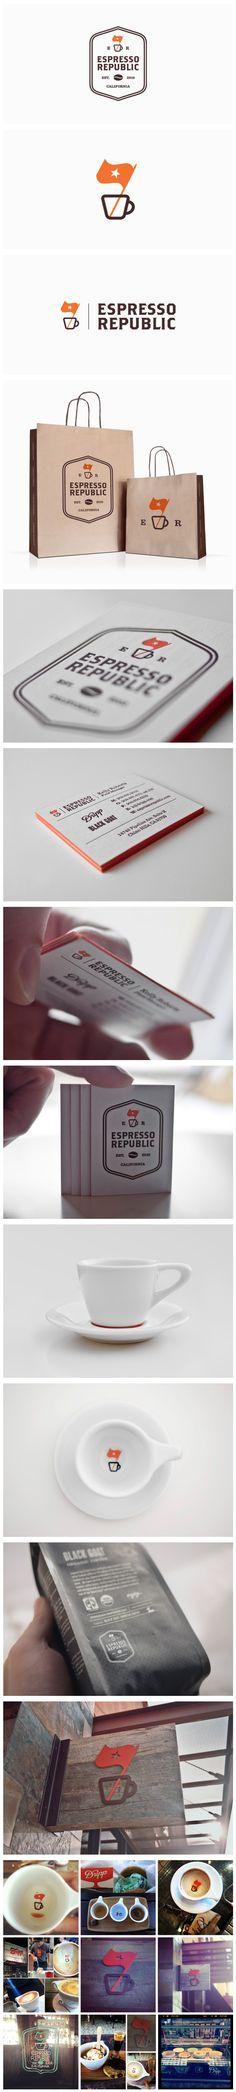 Espresso Republic / Salih Kucukaga